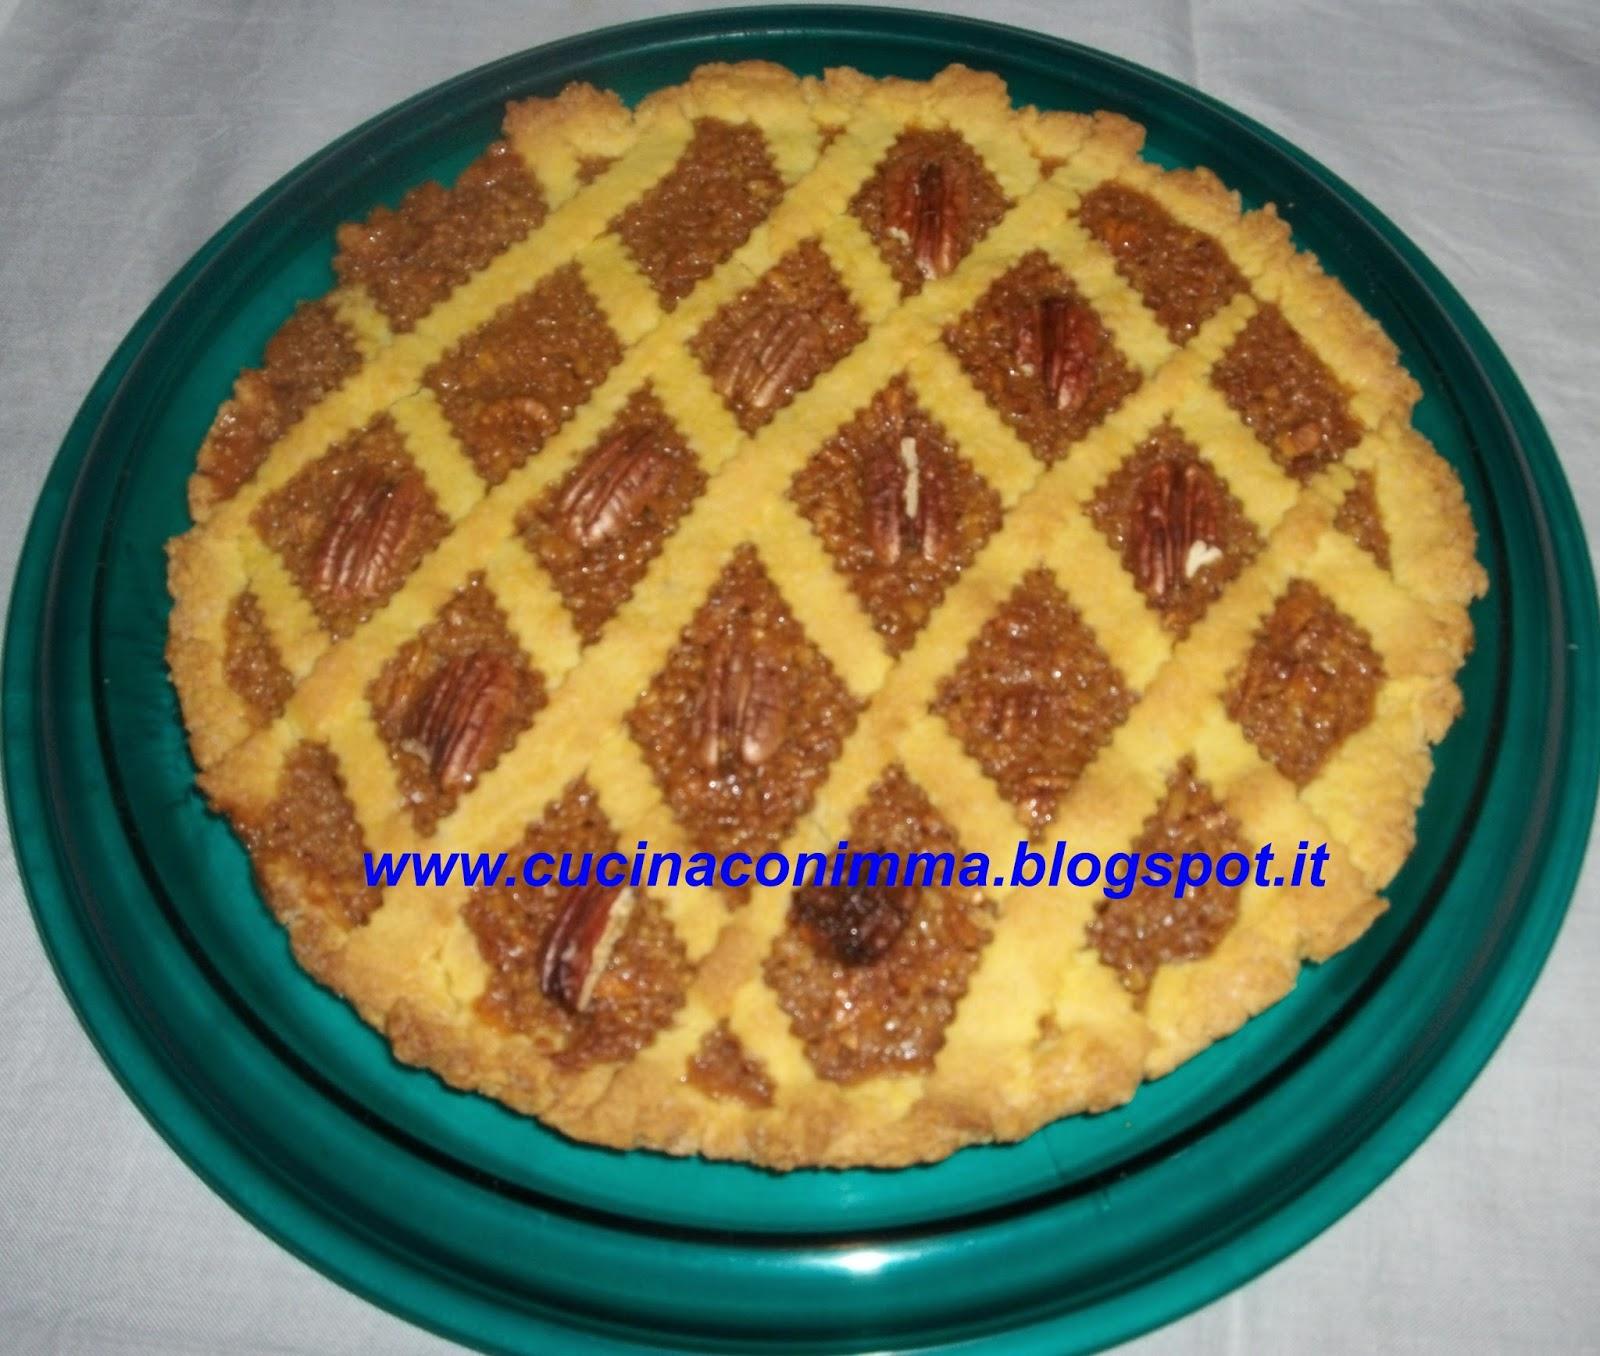 pecan pie in versione italiana